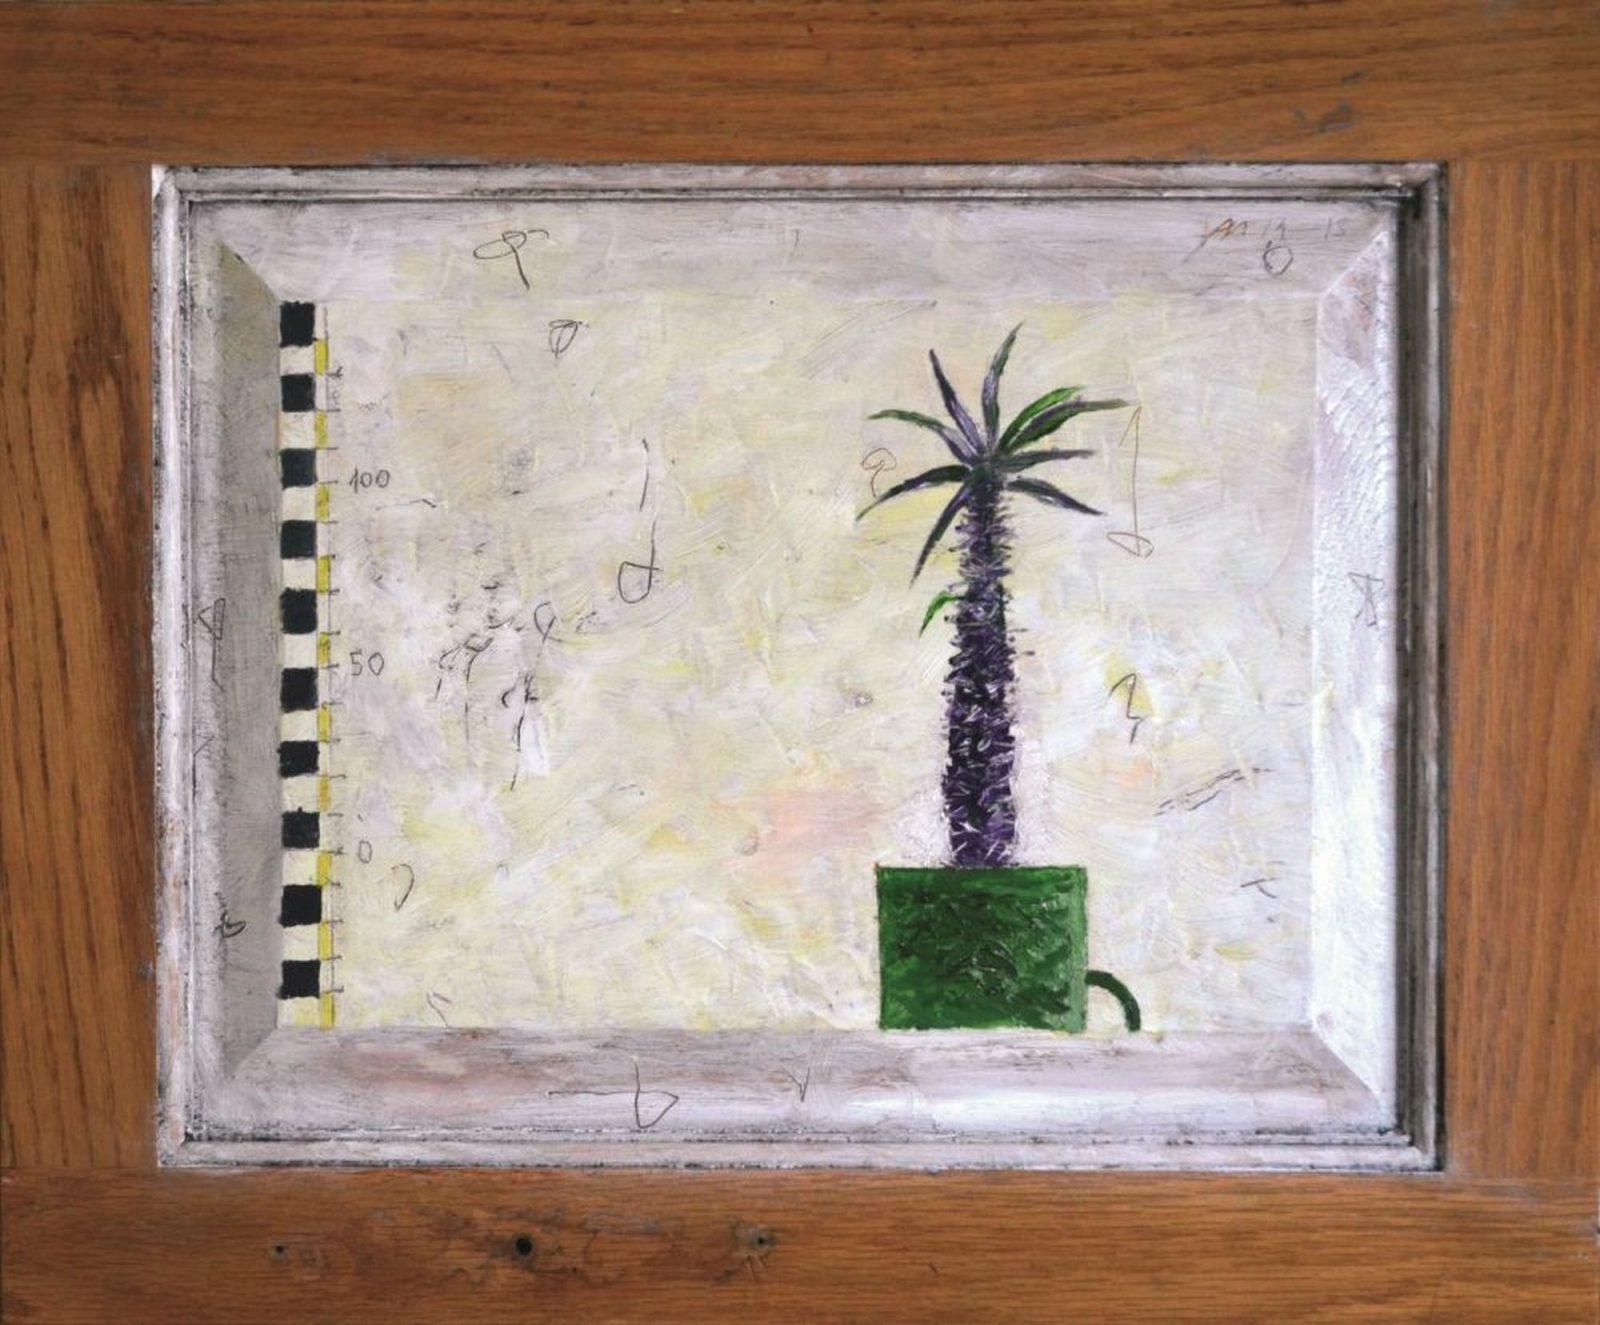 franyo aatoth: 137 cm High Plant